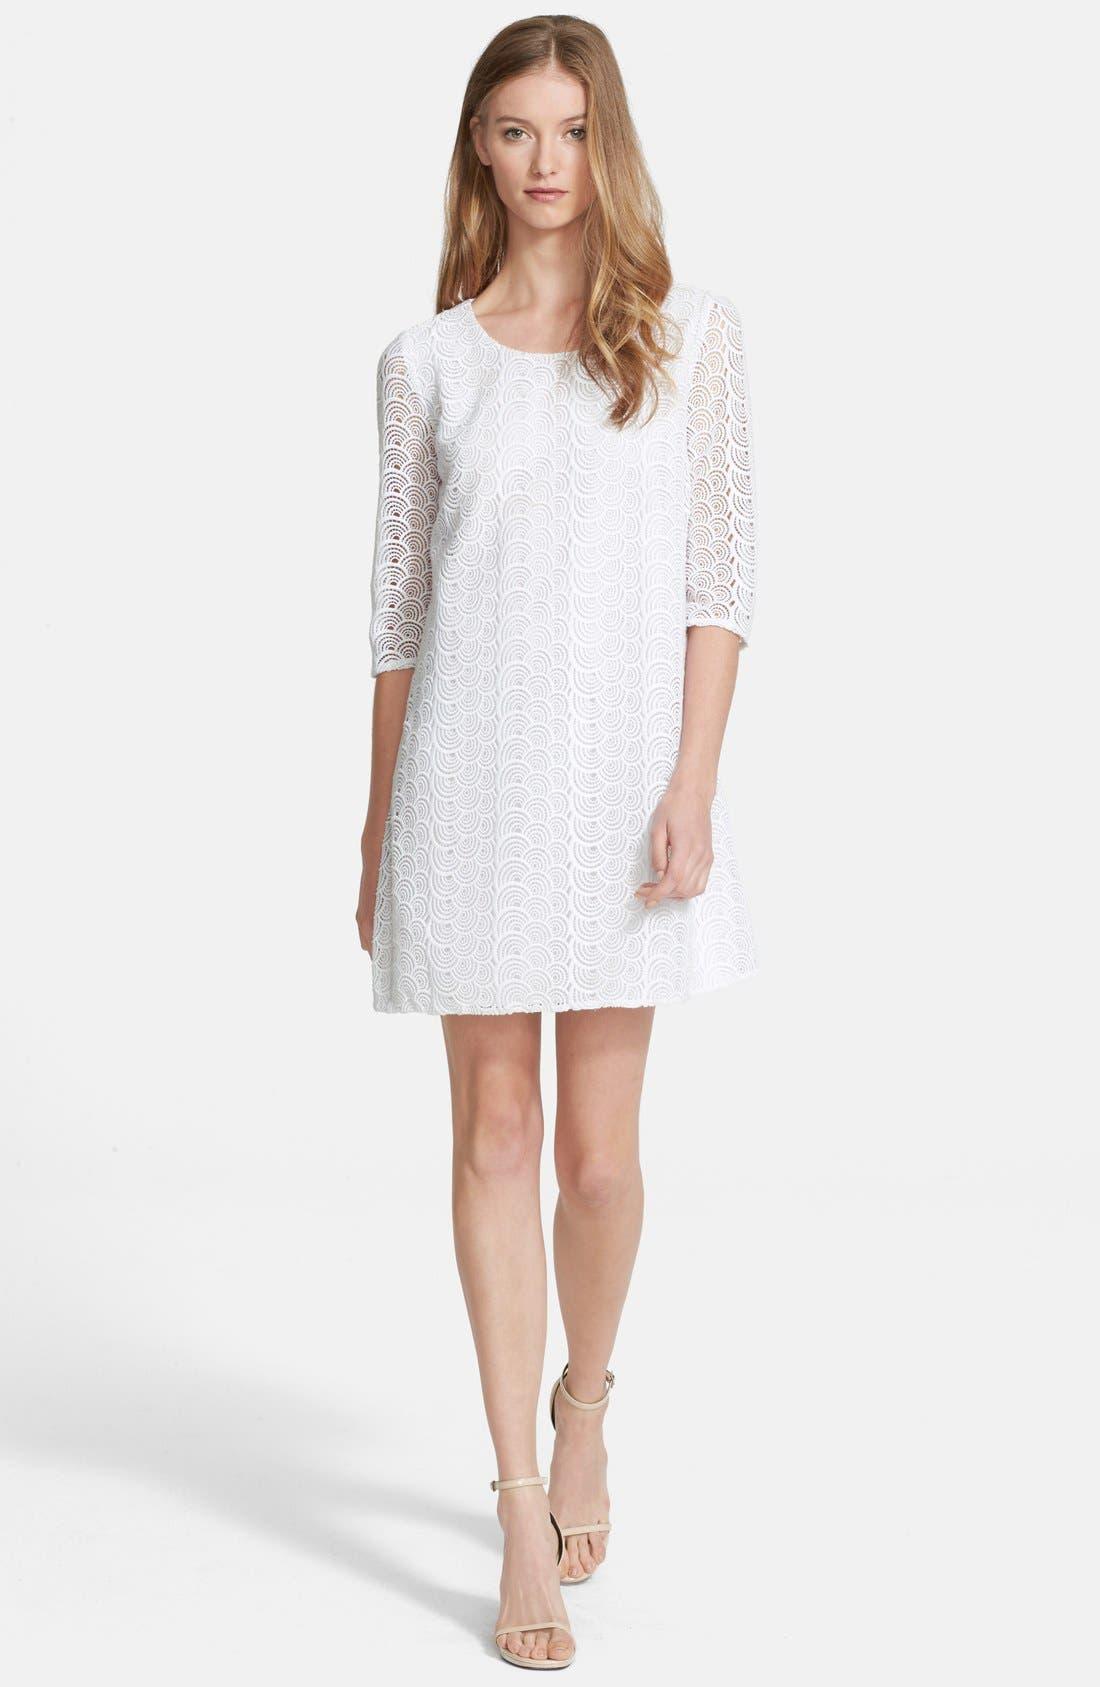 Main Image - Diane von Furstenberg 'Martina' Lace Shift Dress